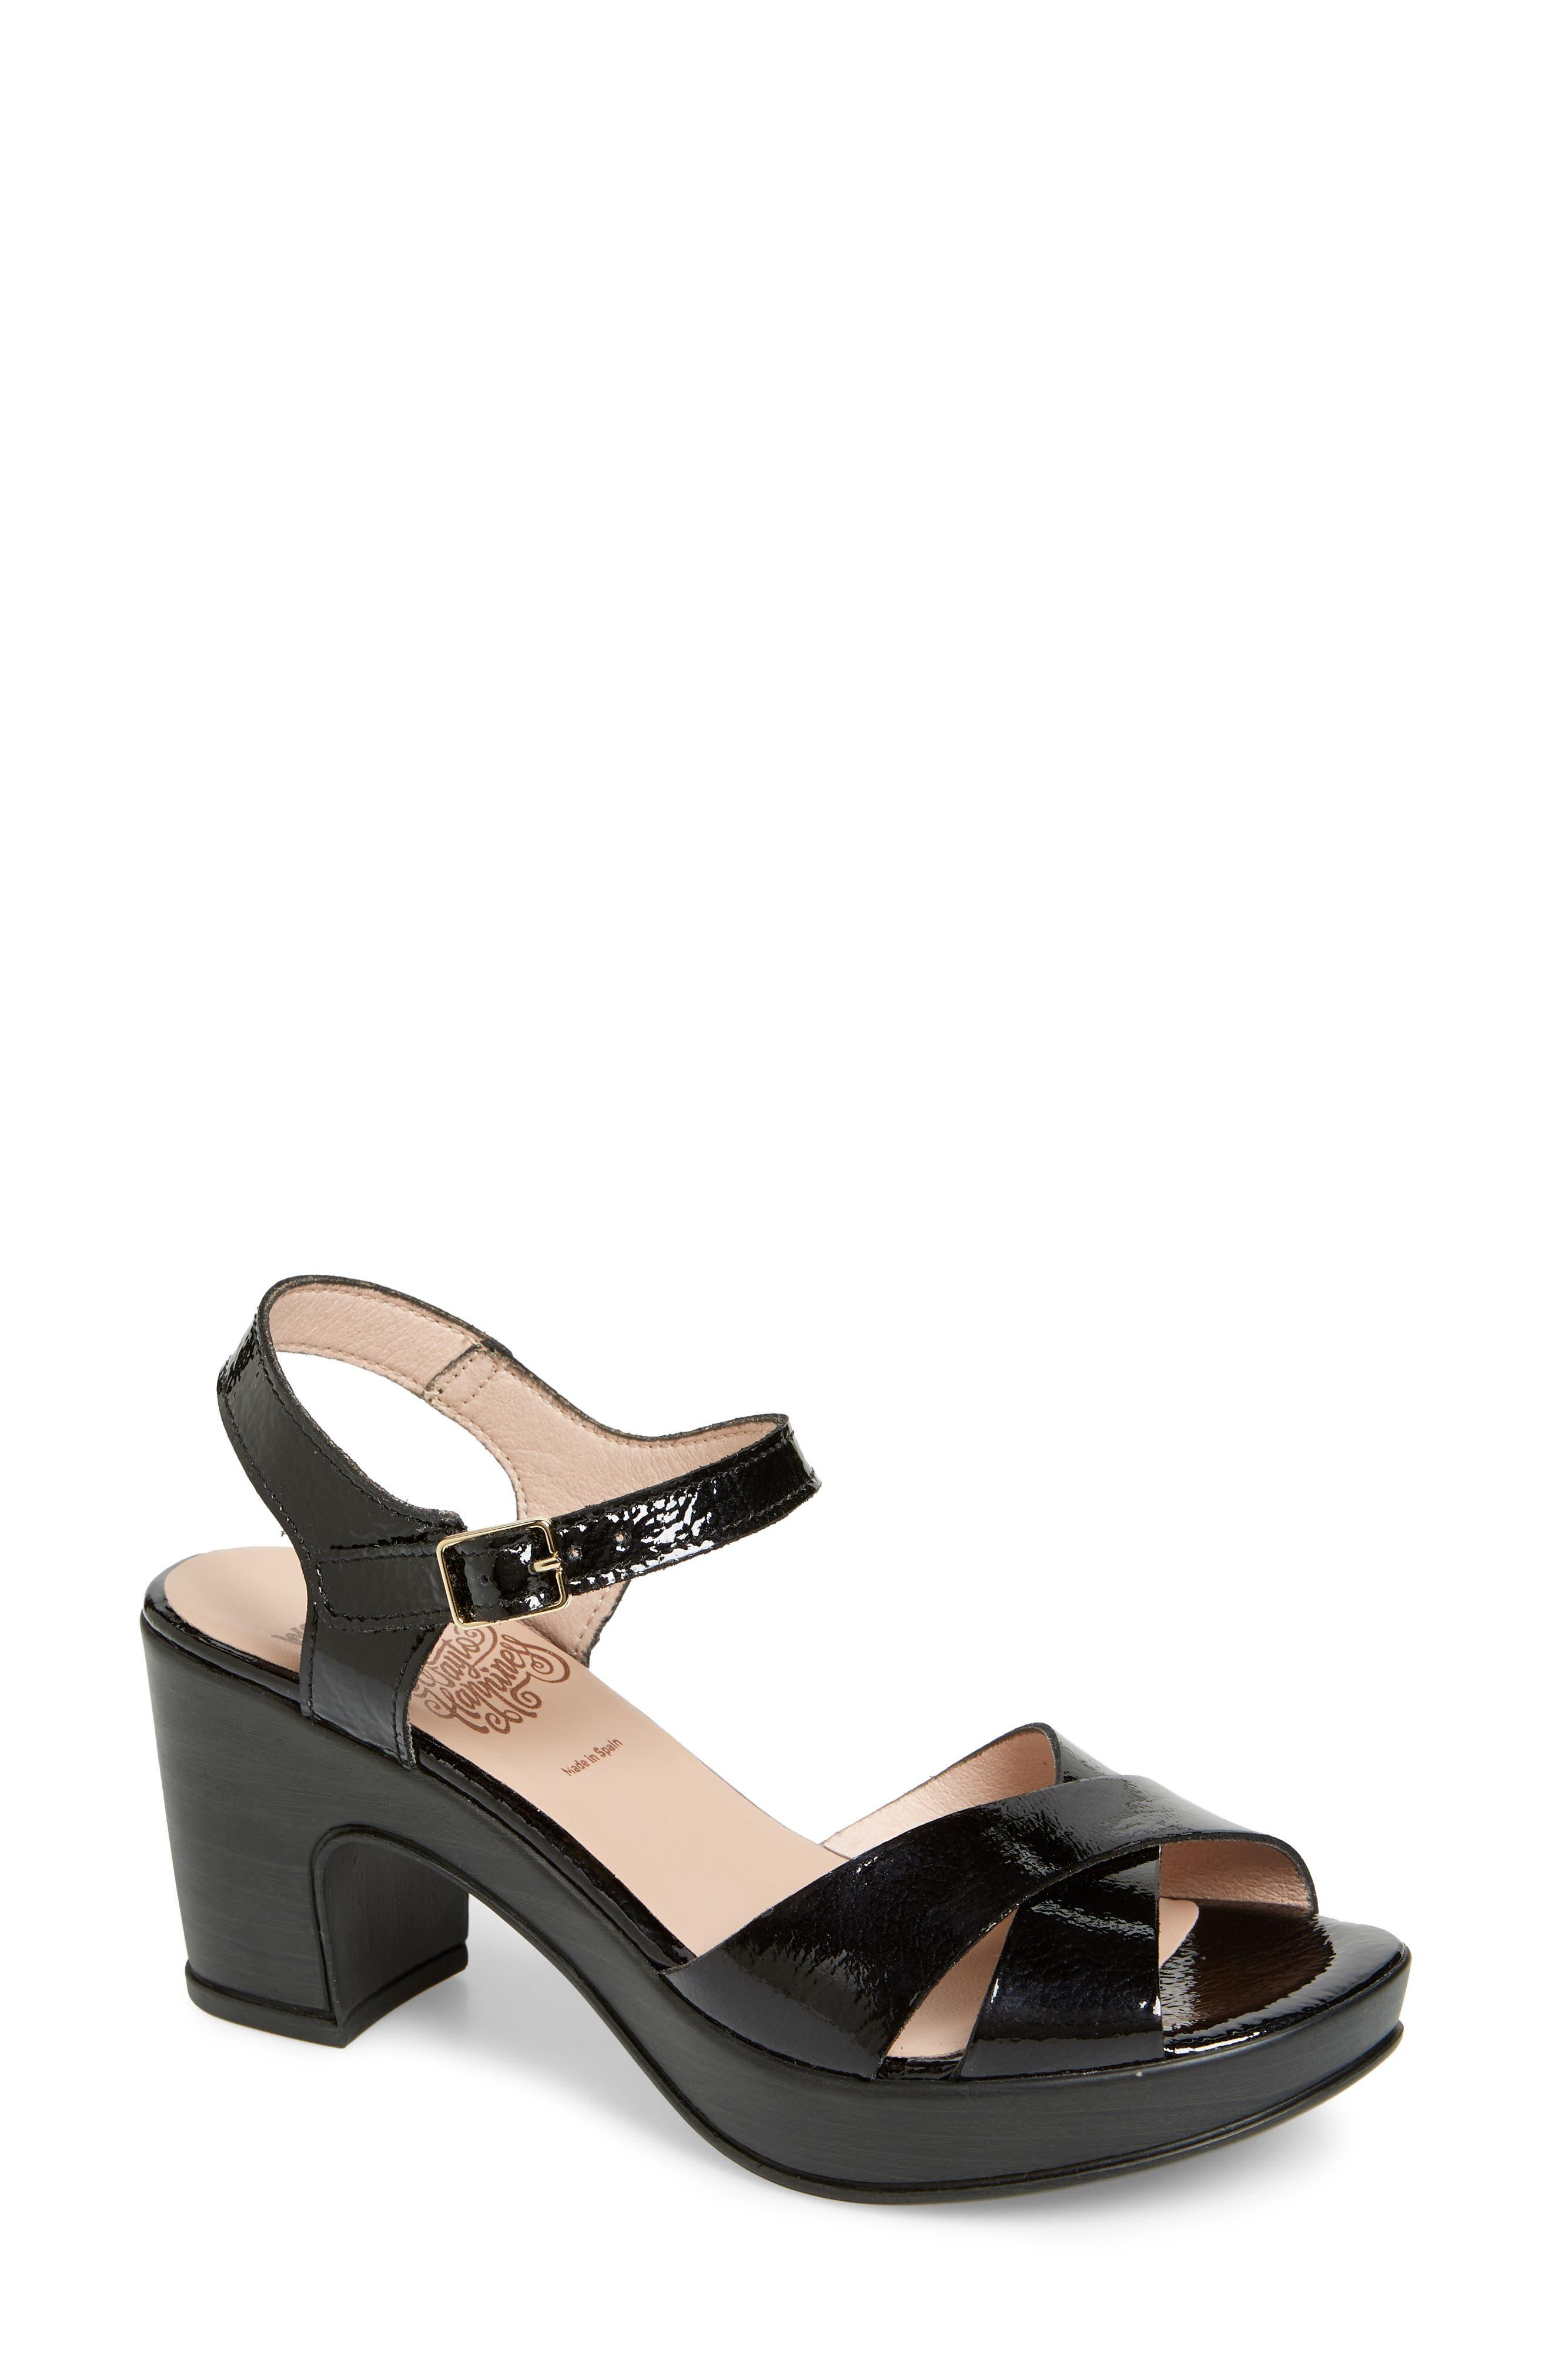 Platform Sandal,                             Main thumbnail 1, color,                             Black Patent Leather